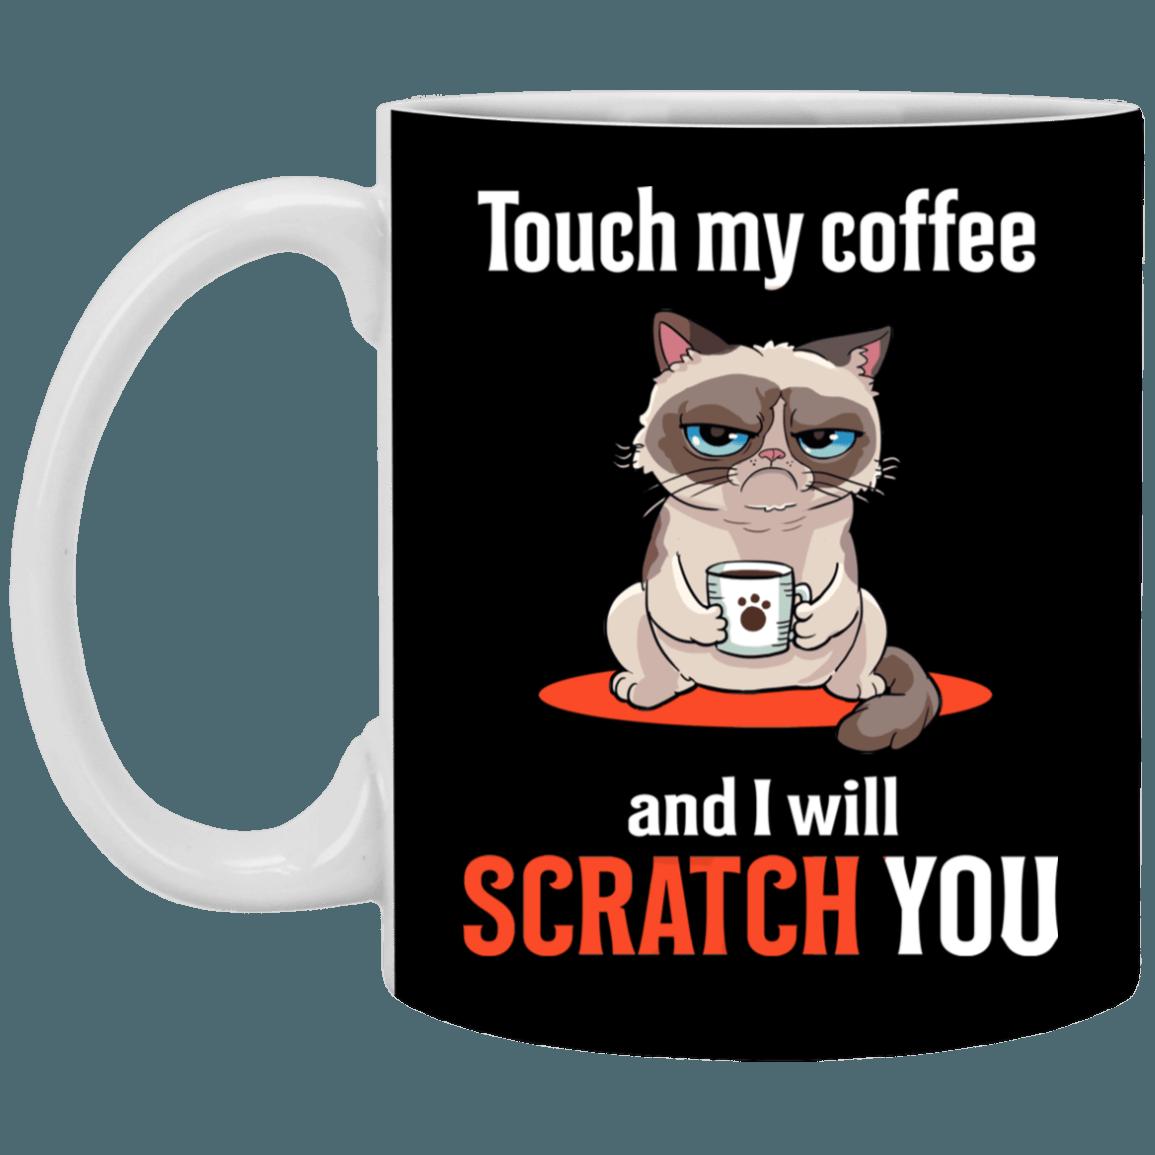 5e029e262 I Will Scratching You Funny Grumpy-Cat Ceramic Coffee Mug - Beer Stein  -Water Bottle - Color Changing Mug - CubeBik ™